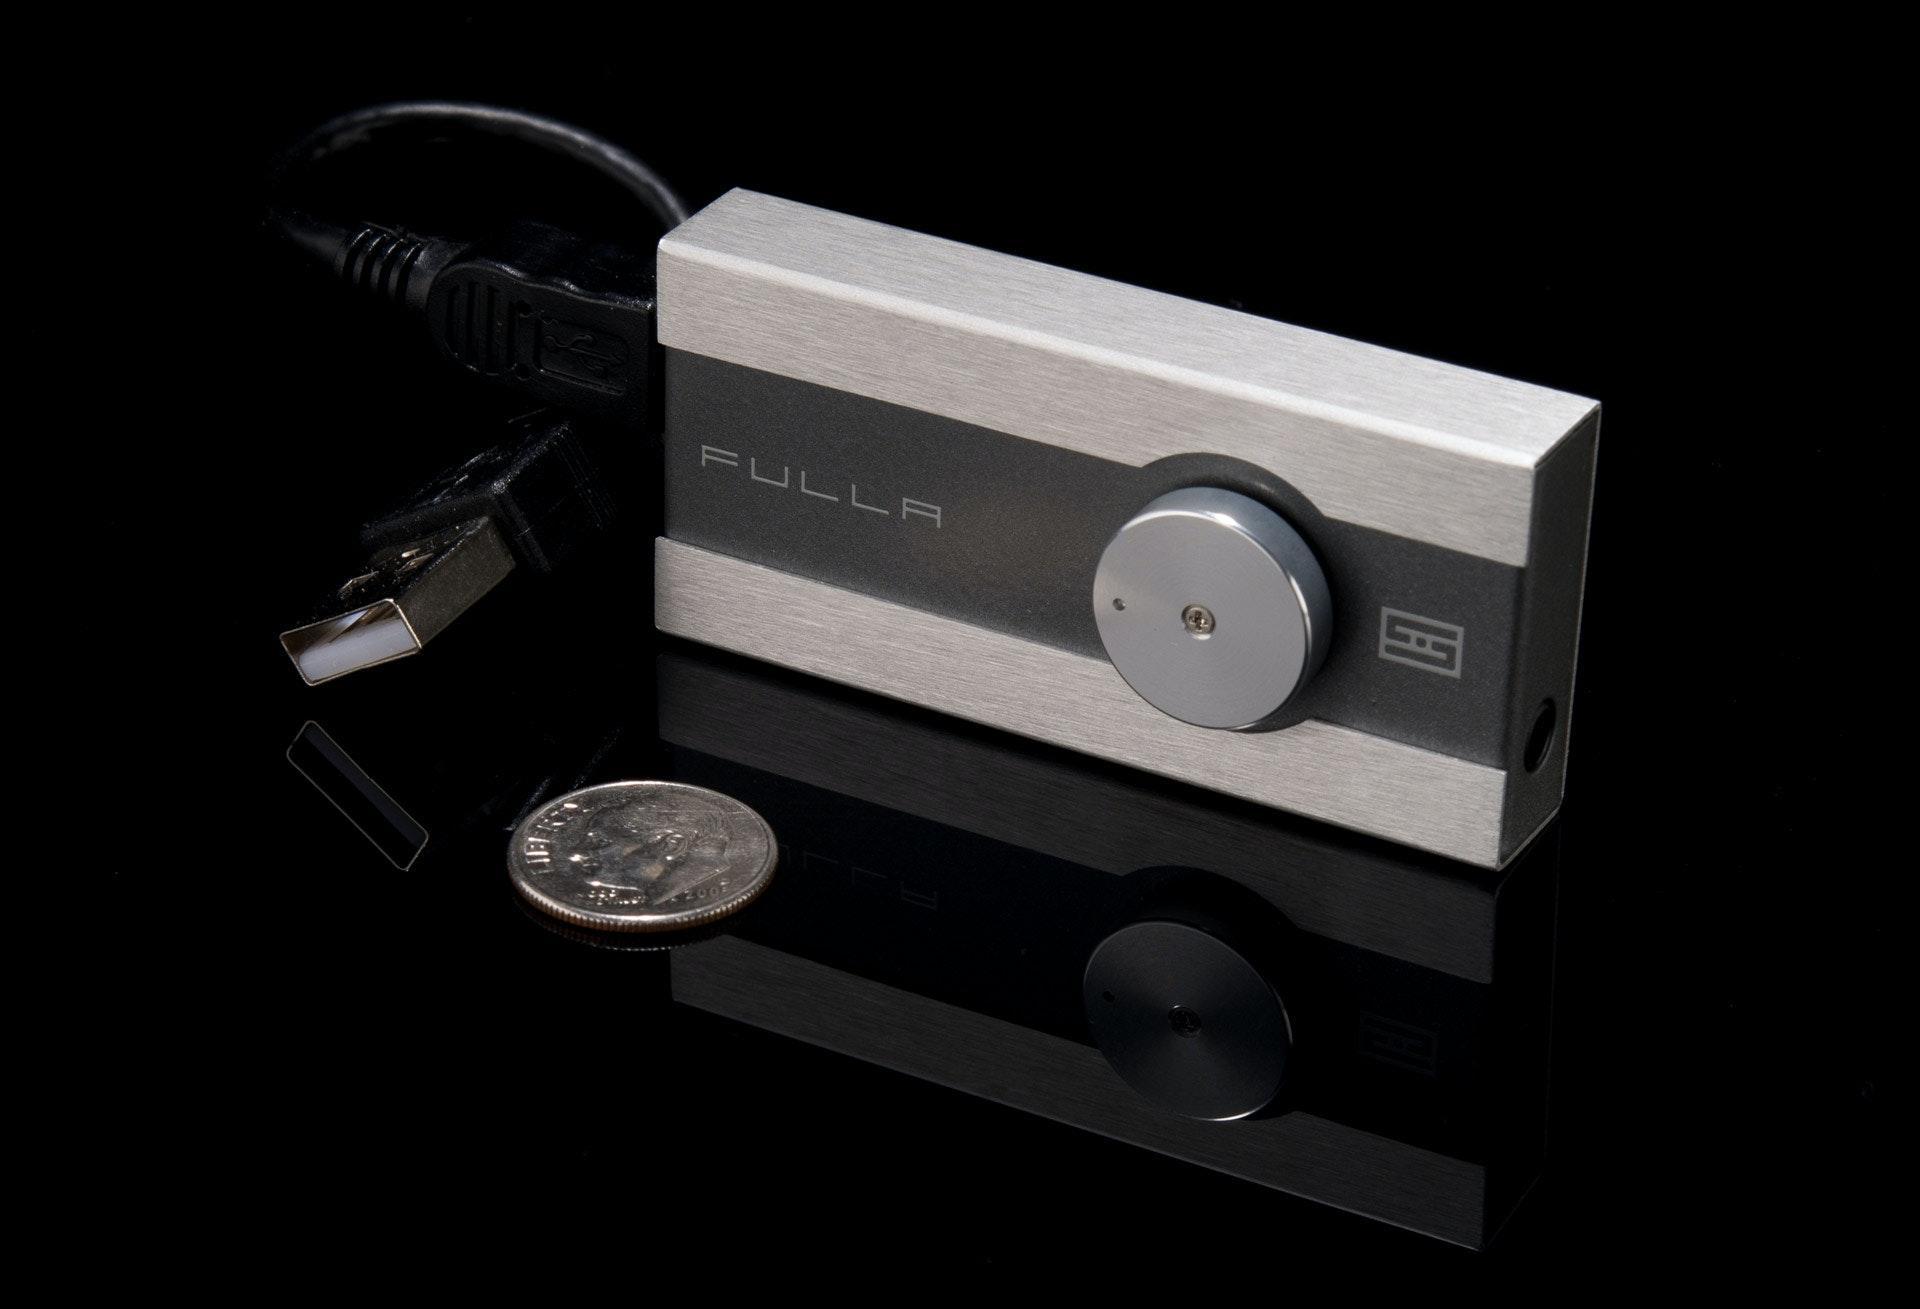 $80 Schiit Fulla DAC + Amp Combo